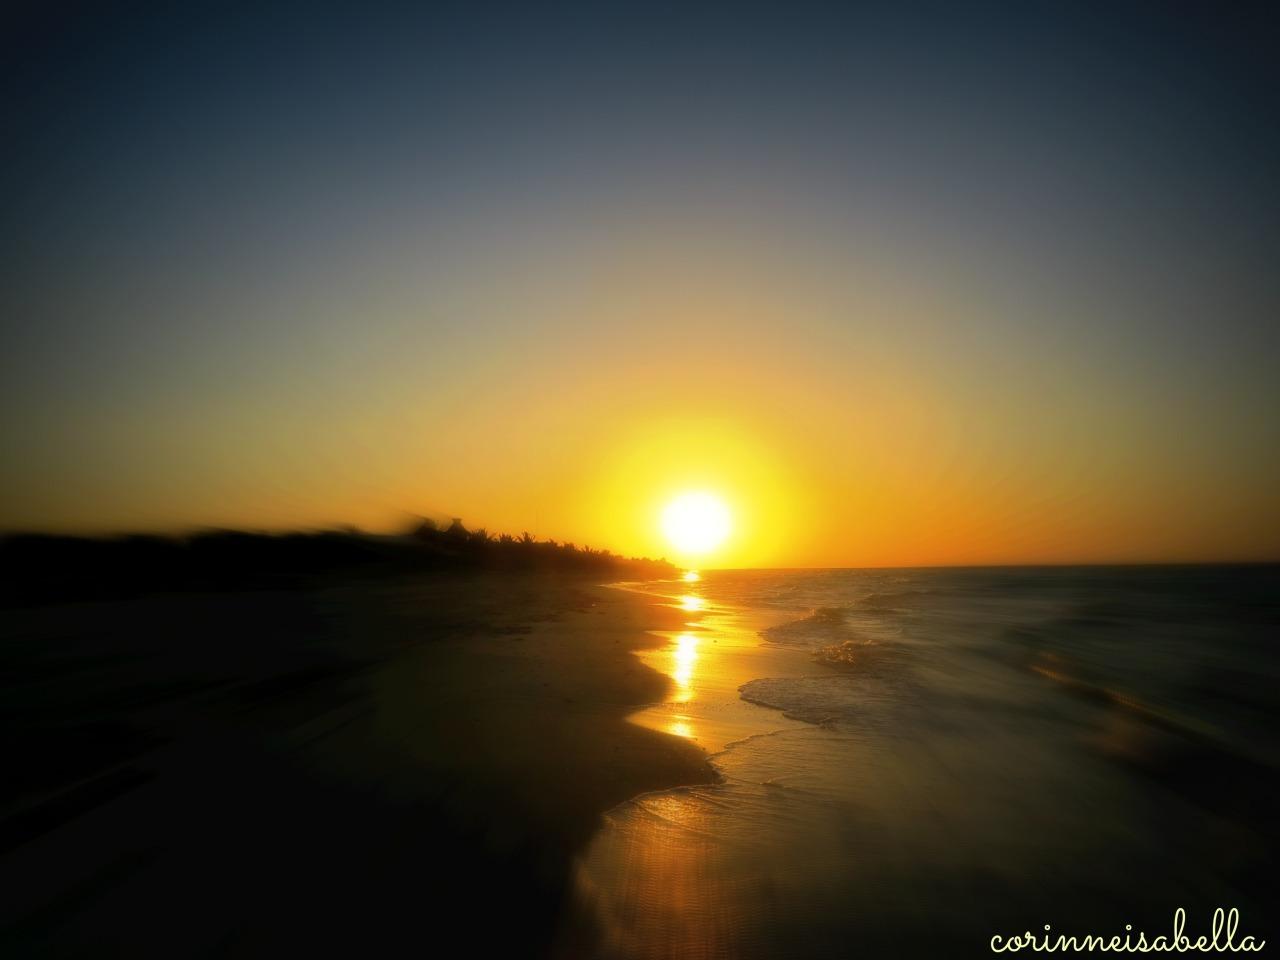 another shot, same sunset, sameday